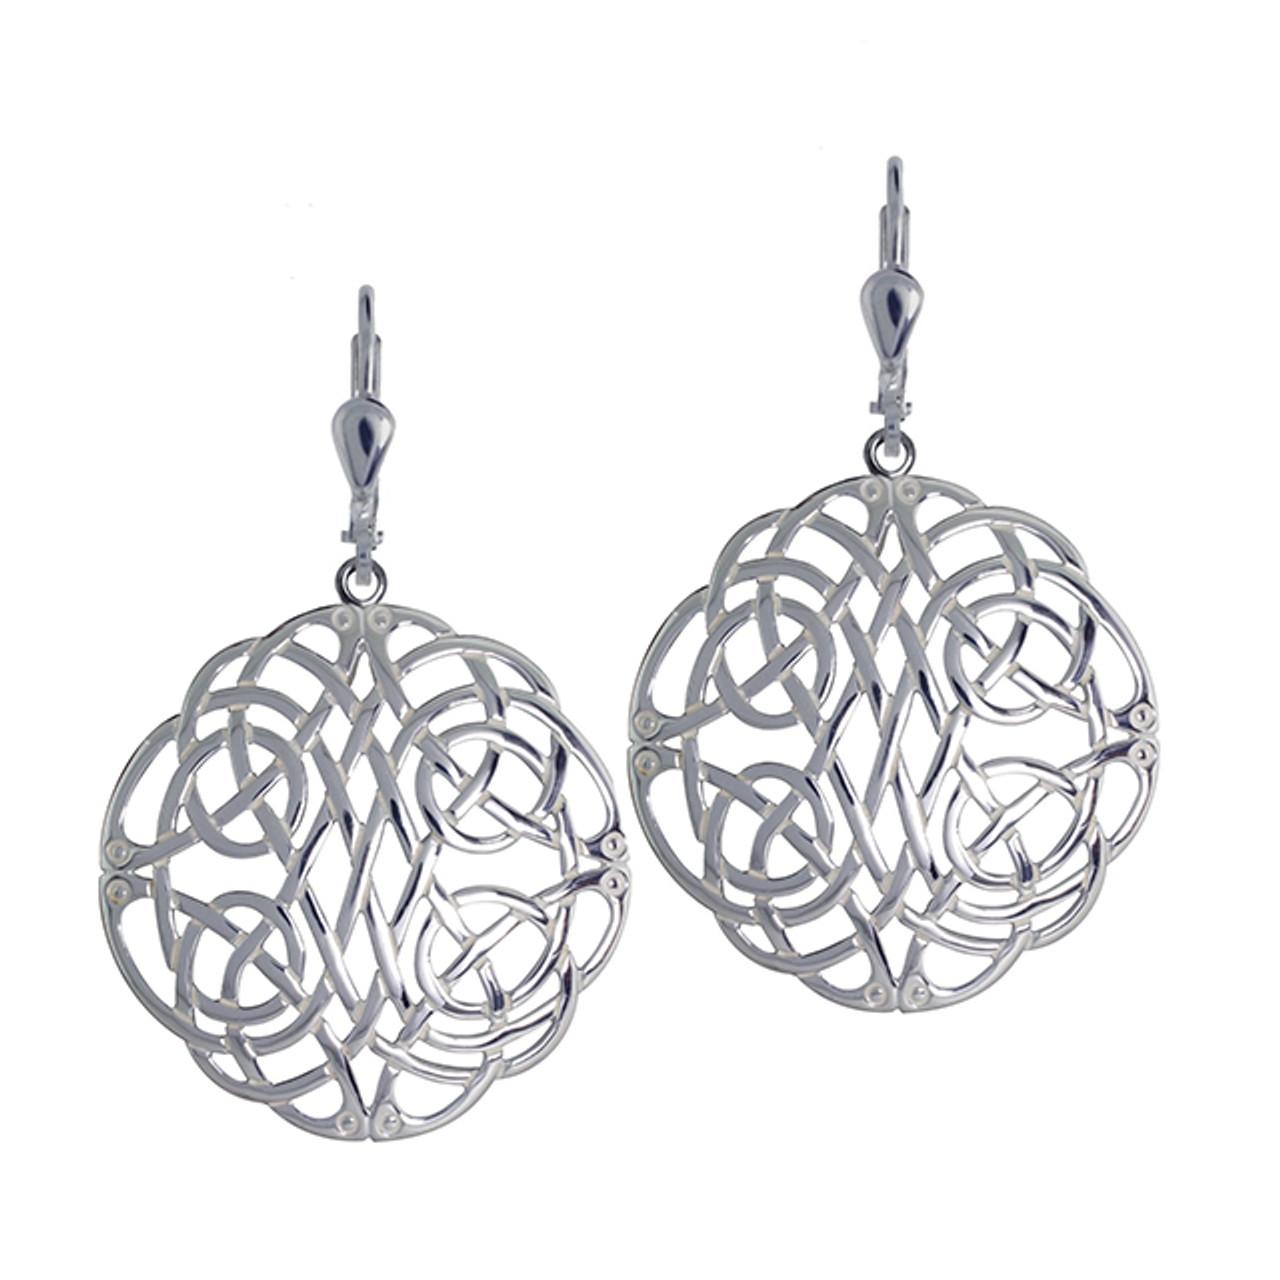 Intricate Celtic Knot Earrings